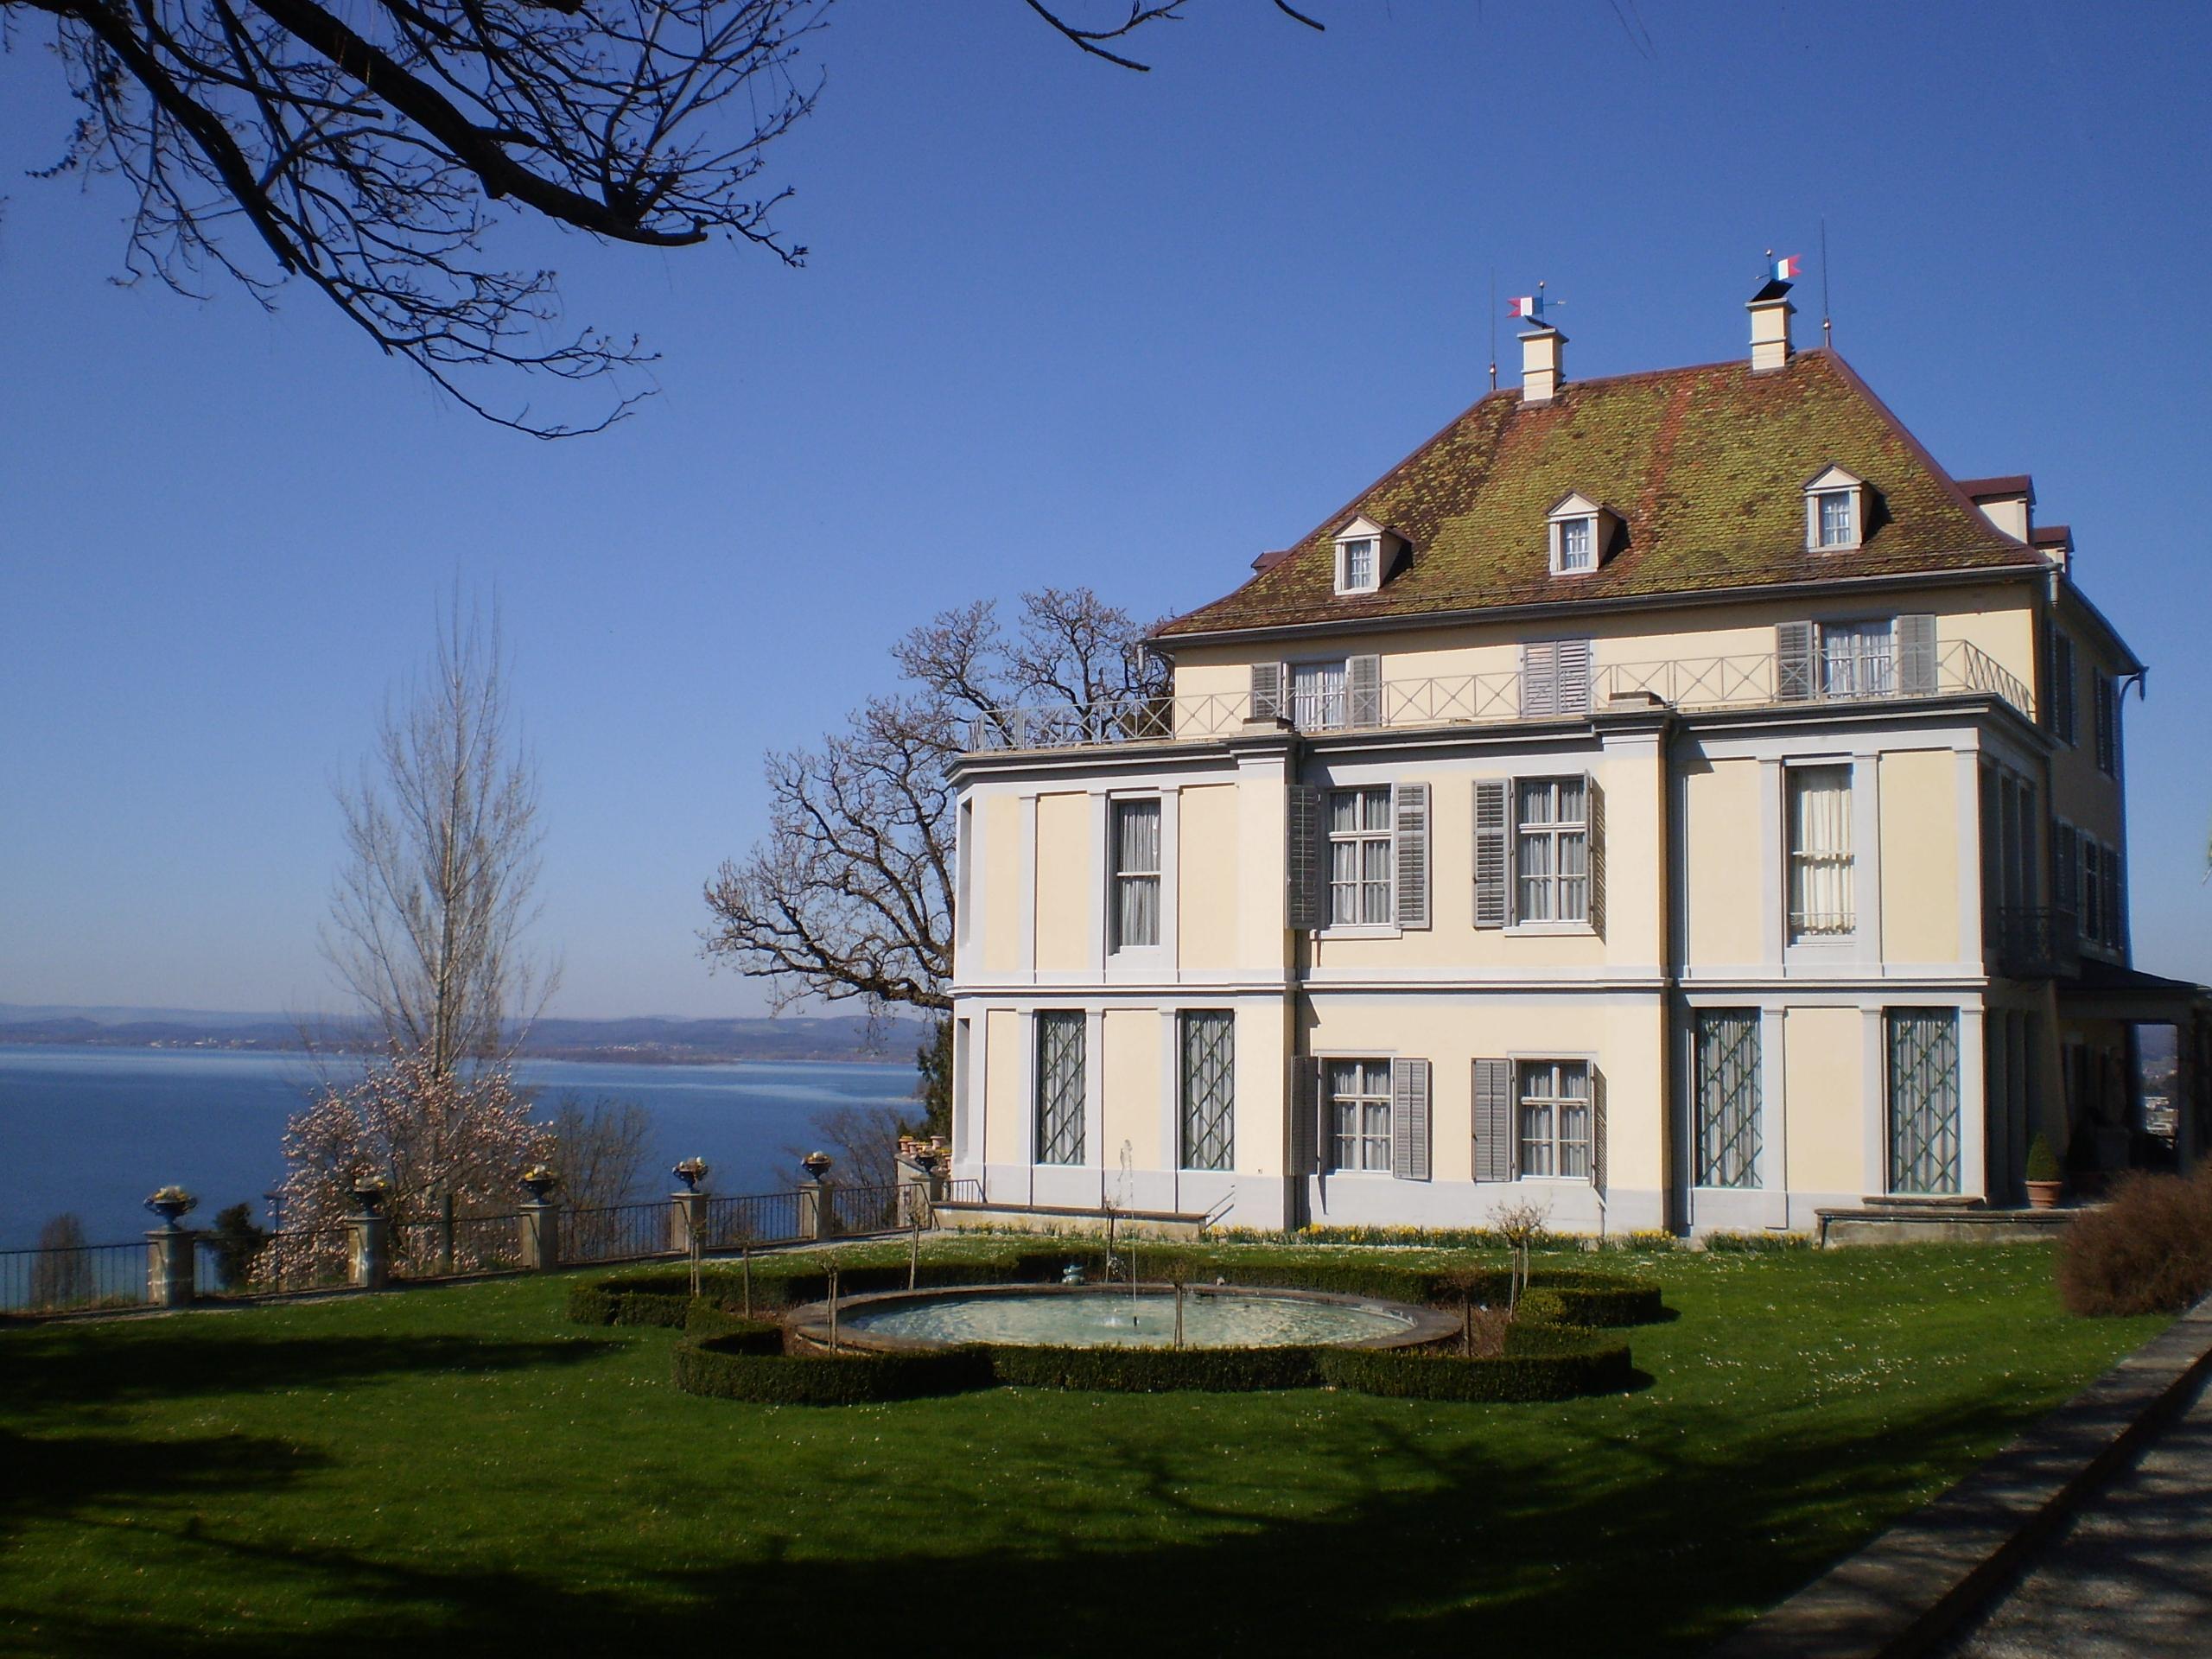 Schloss Arenenberg mit Kapelle und Napoleonmuseum